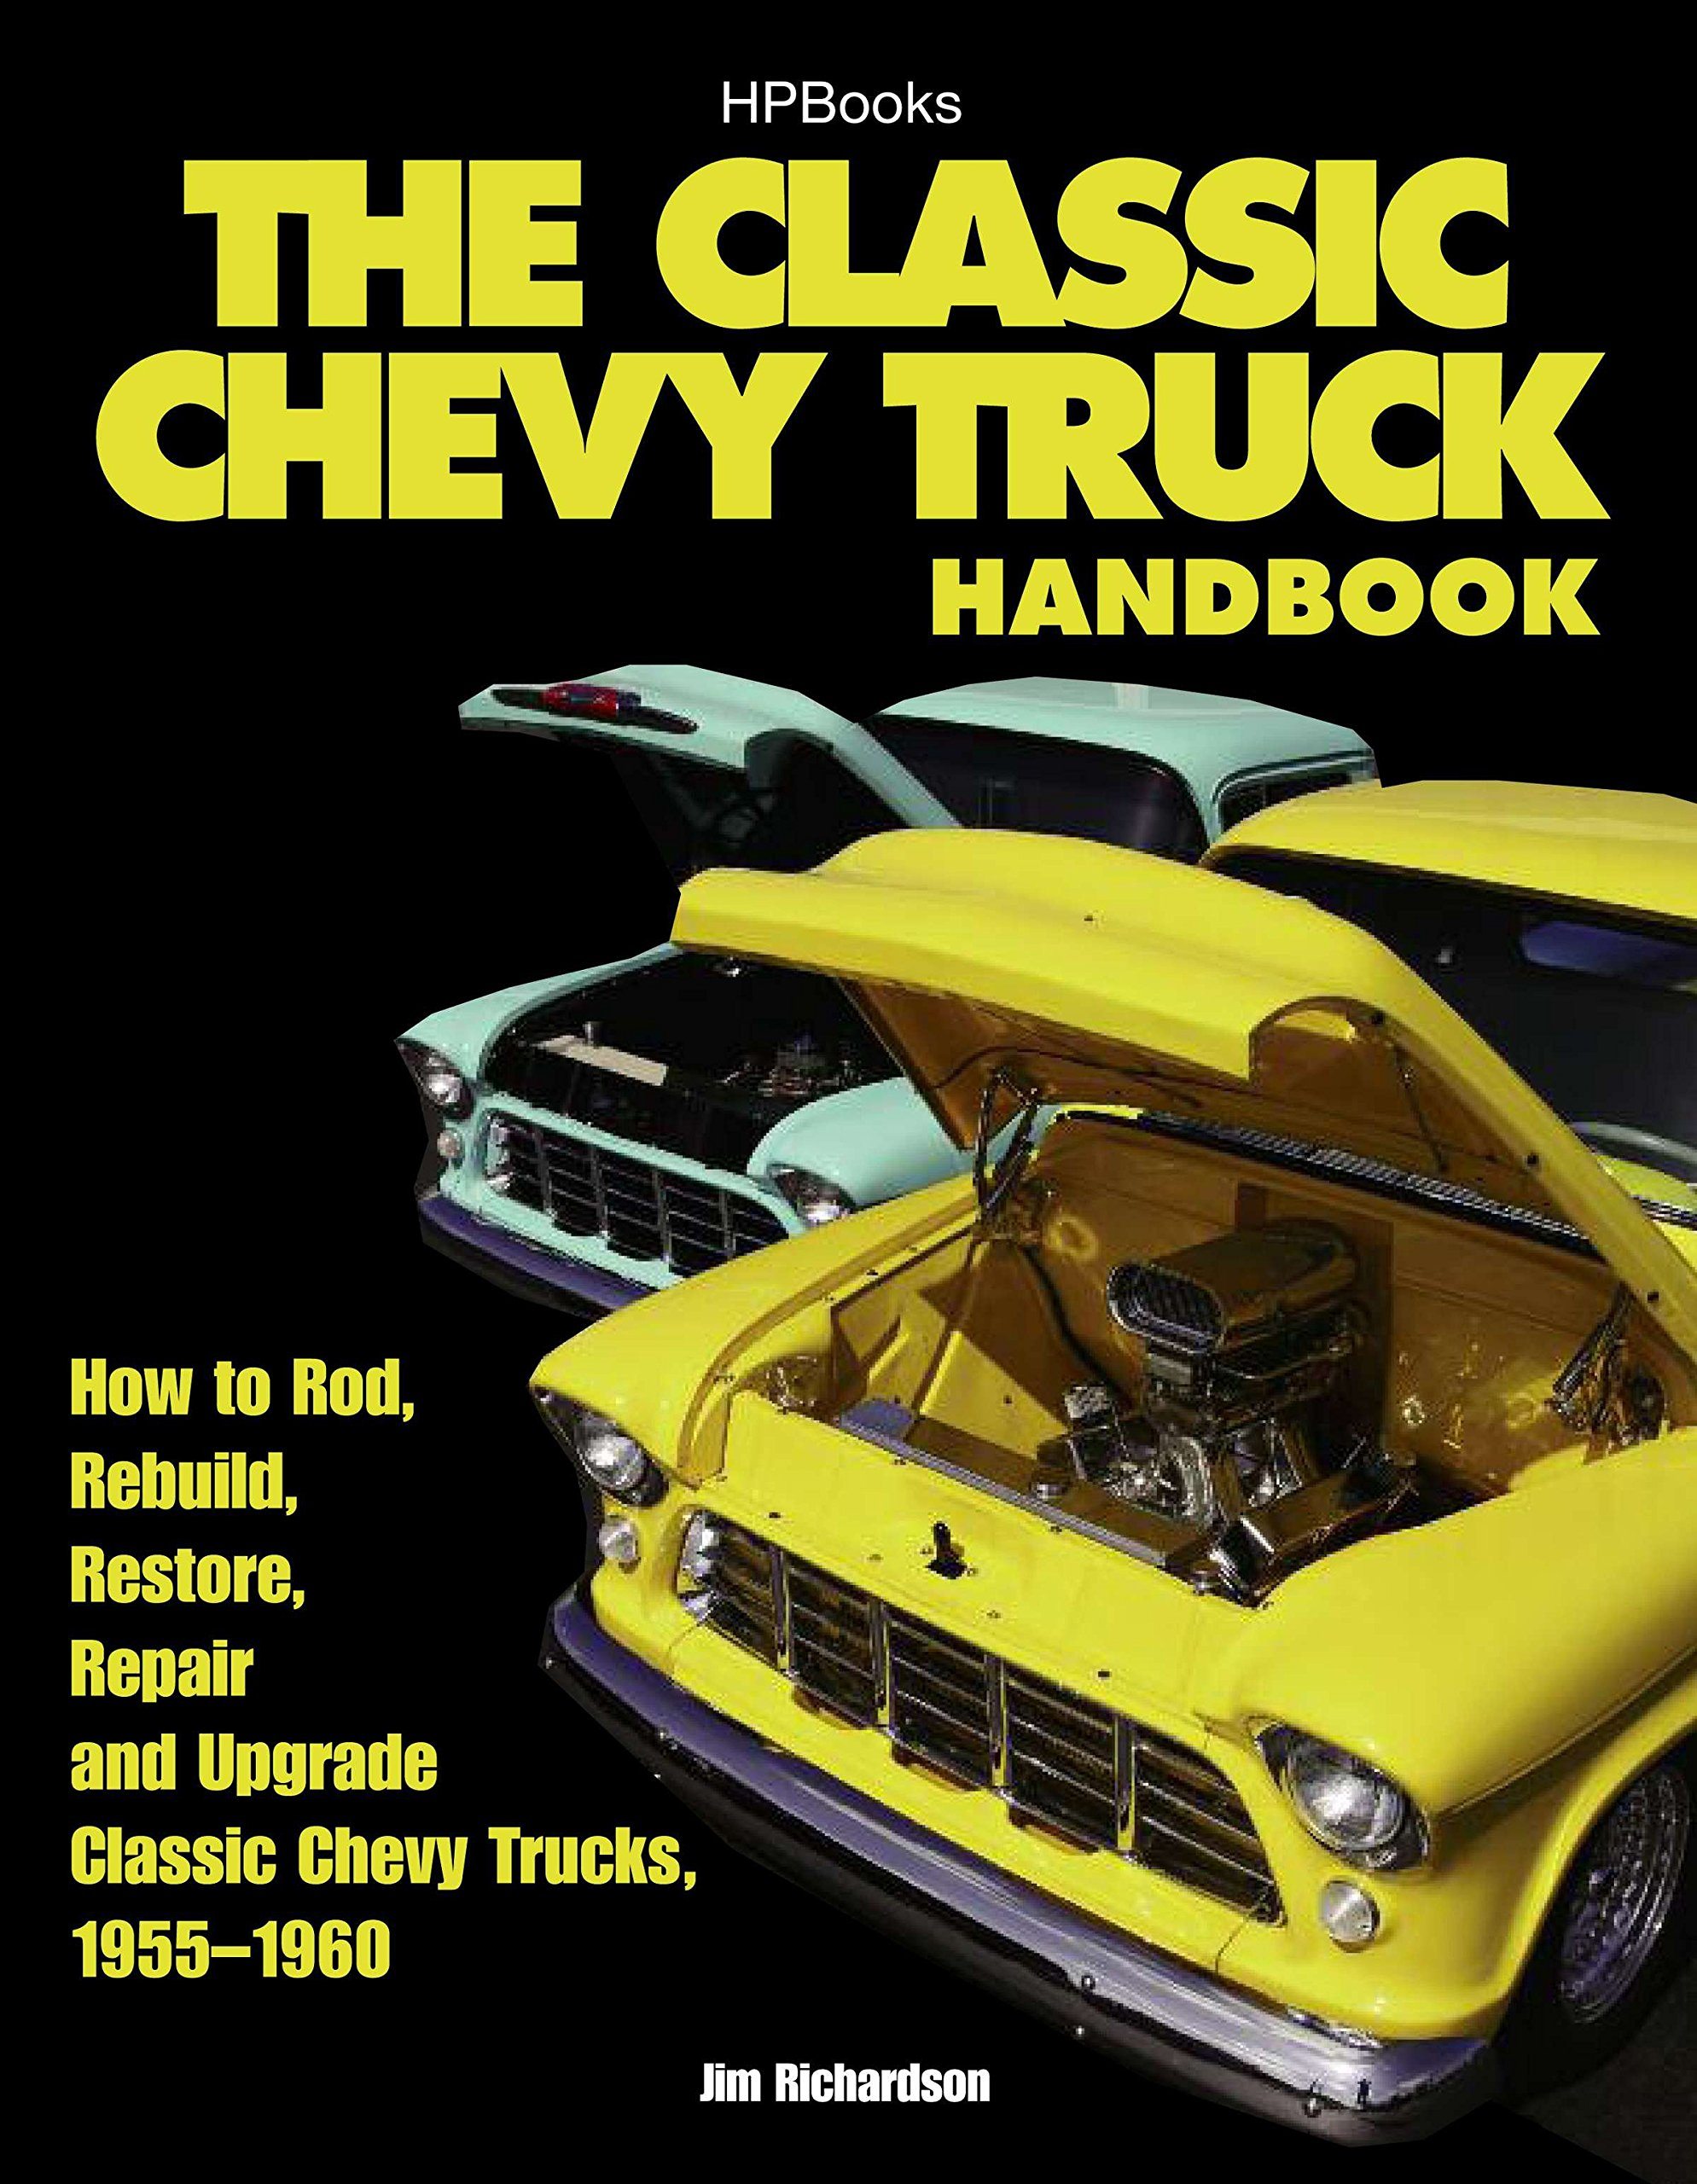 The Classic Chevy Truck Handbook HP 1534: How to Rod, Rebuild, Restore,  Repair and Upgrade Classic Chevy Trucks, 1955-1960: Jim Richardson:  9781557885340: ...